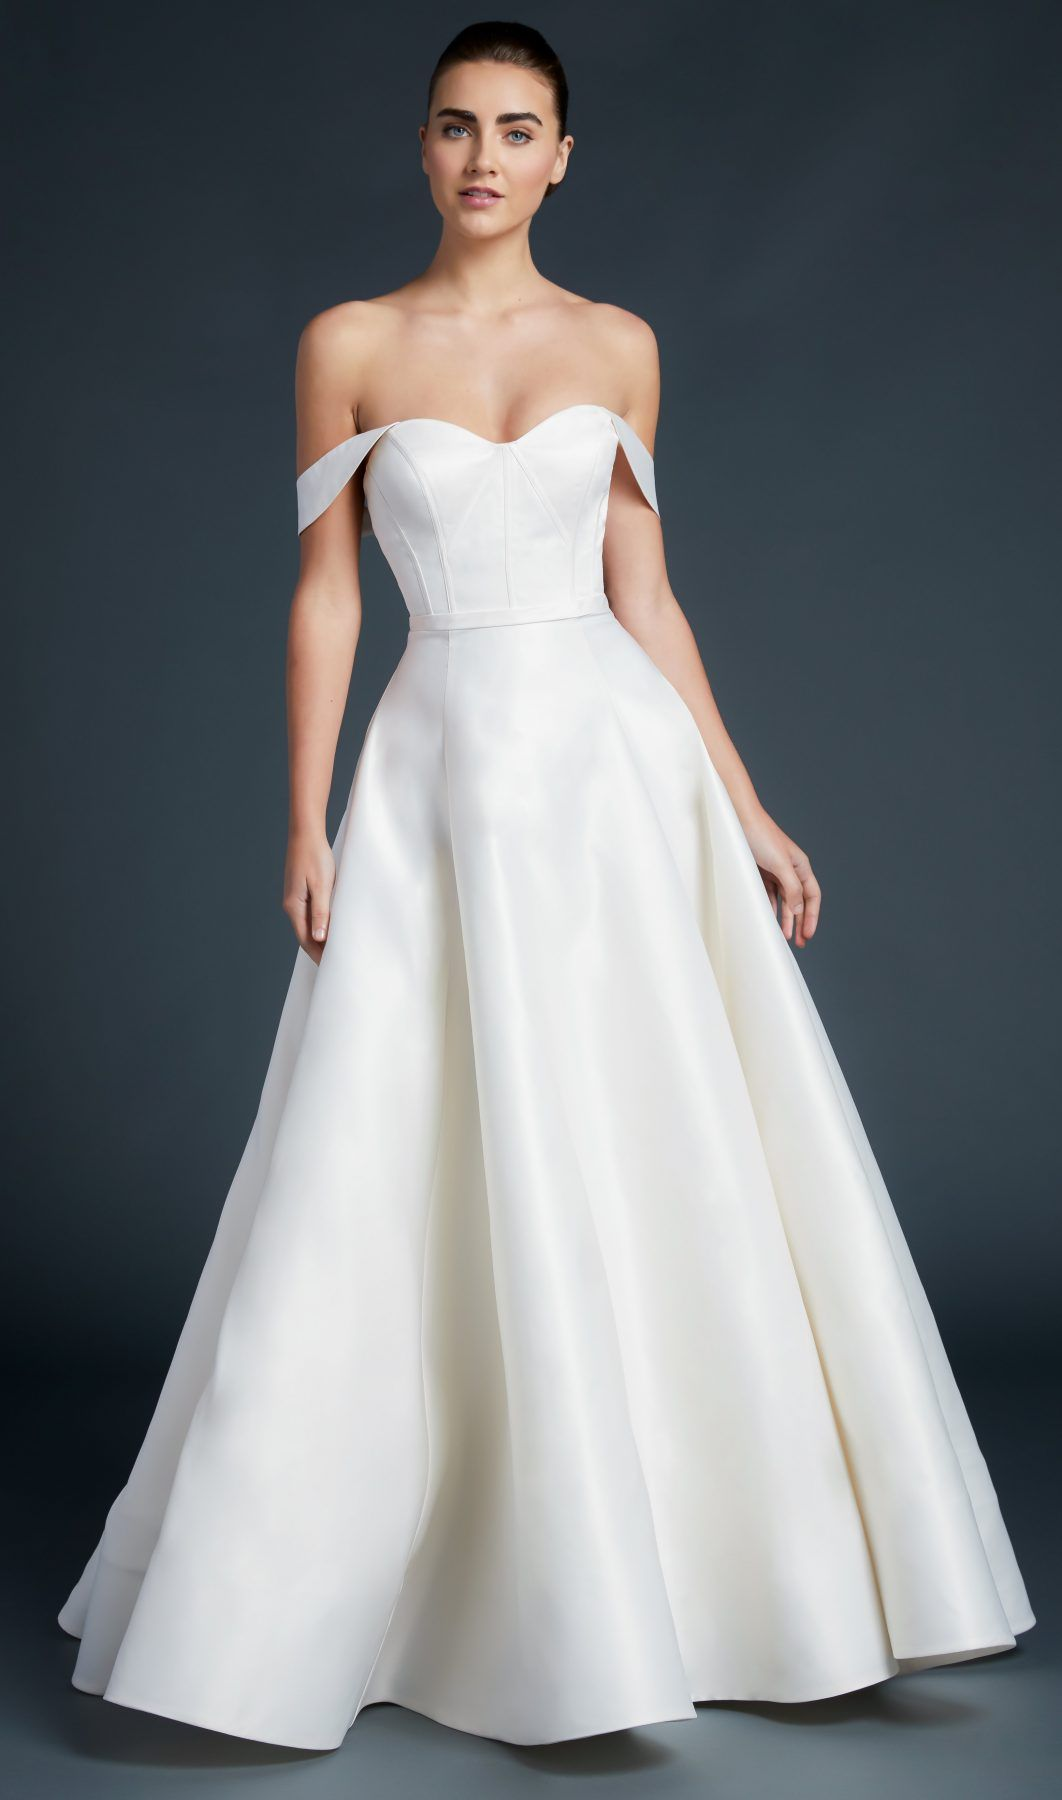 sweetheart neckline off the shoulder straps a-line wedding